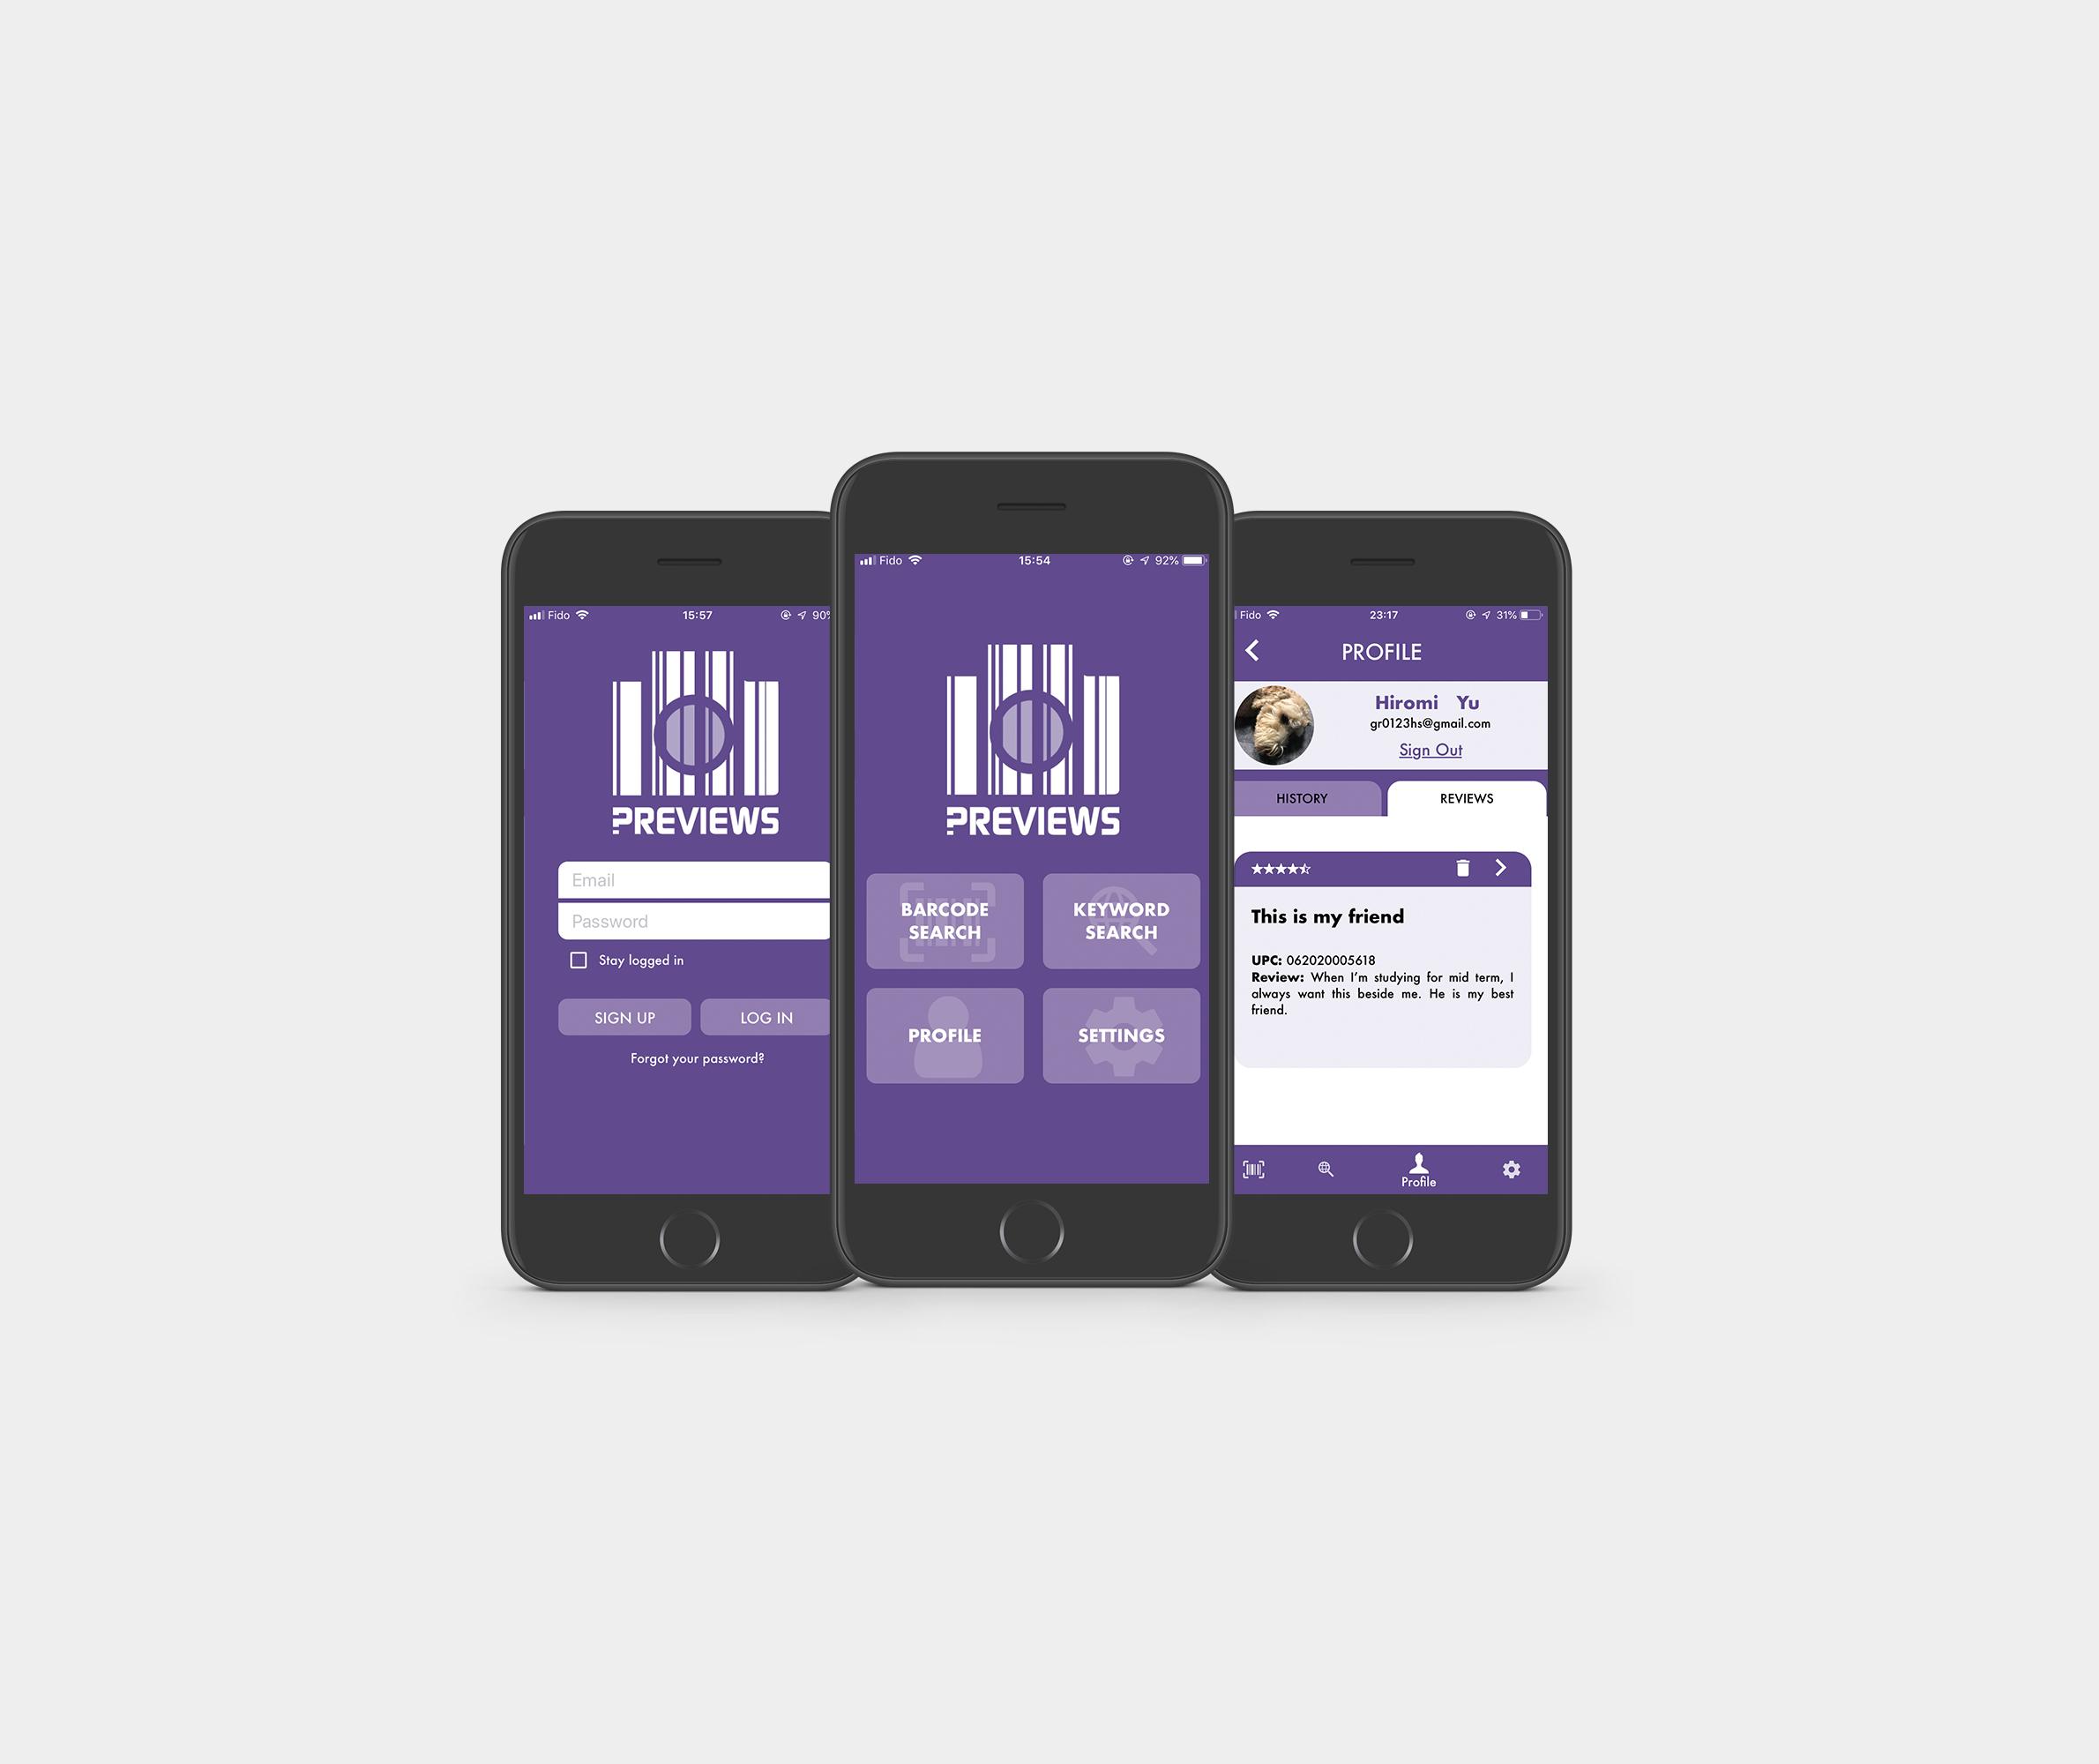 Barcode Scaner App - Preview